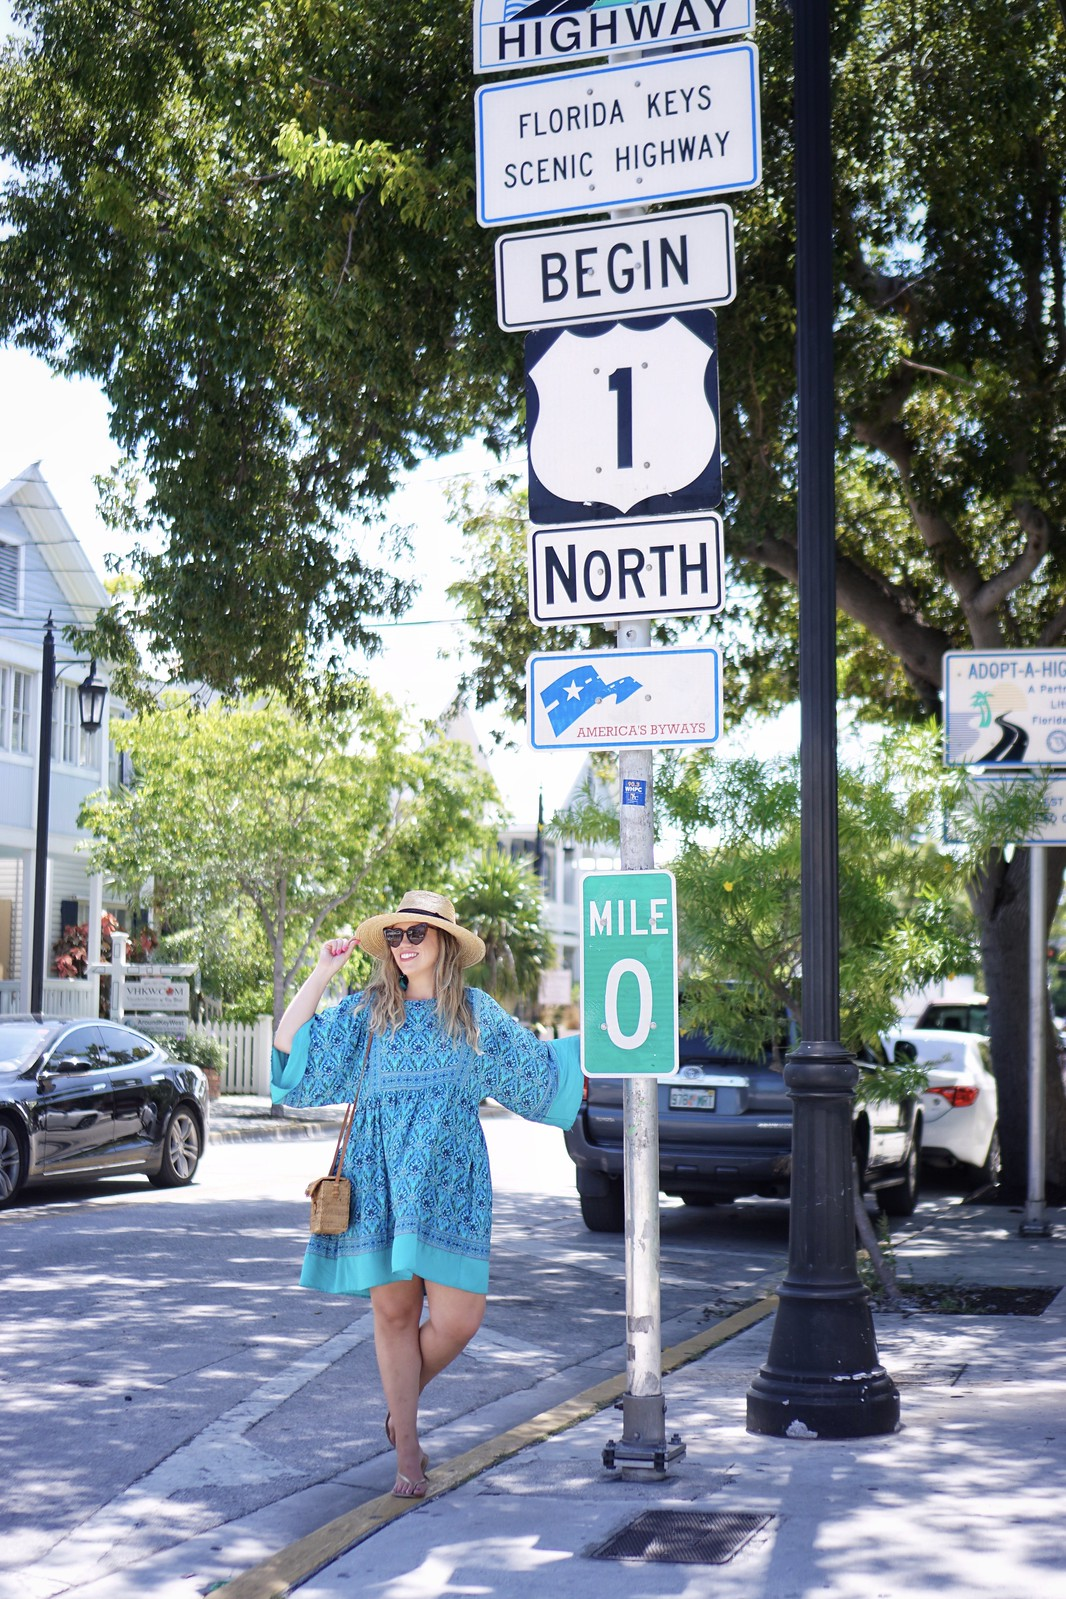 mile-marker-0-ultimate-road-trip-5-days-florida-keys-itinerary-what-to-do-key-west-key-largo-islamorada-marathon-miami-vacation-guide